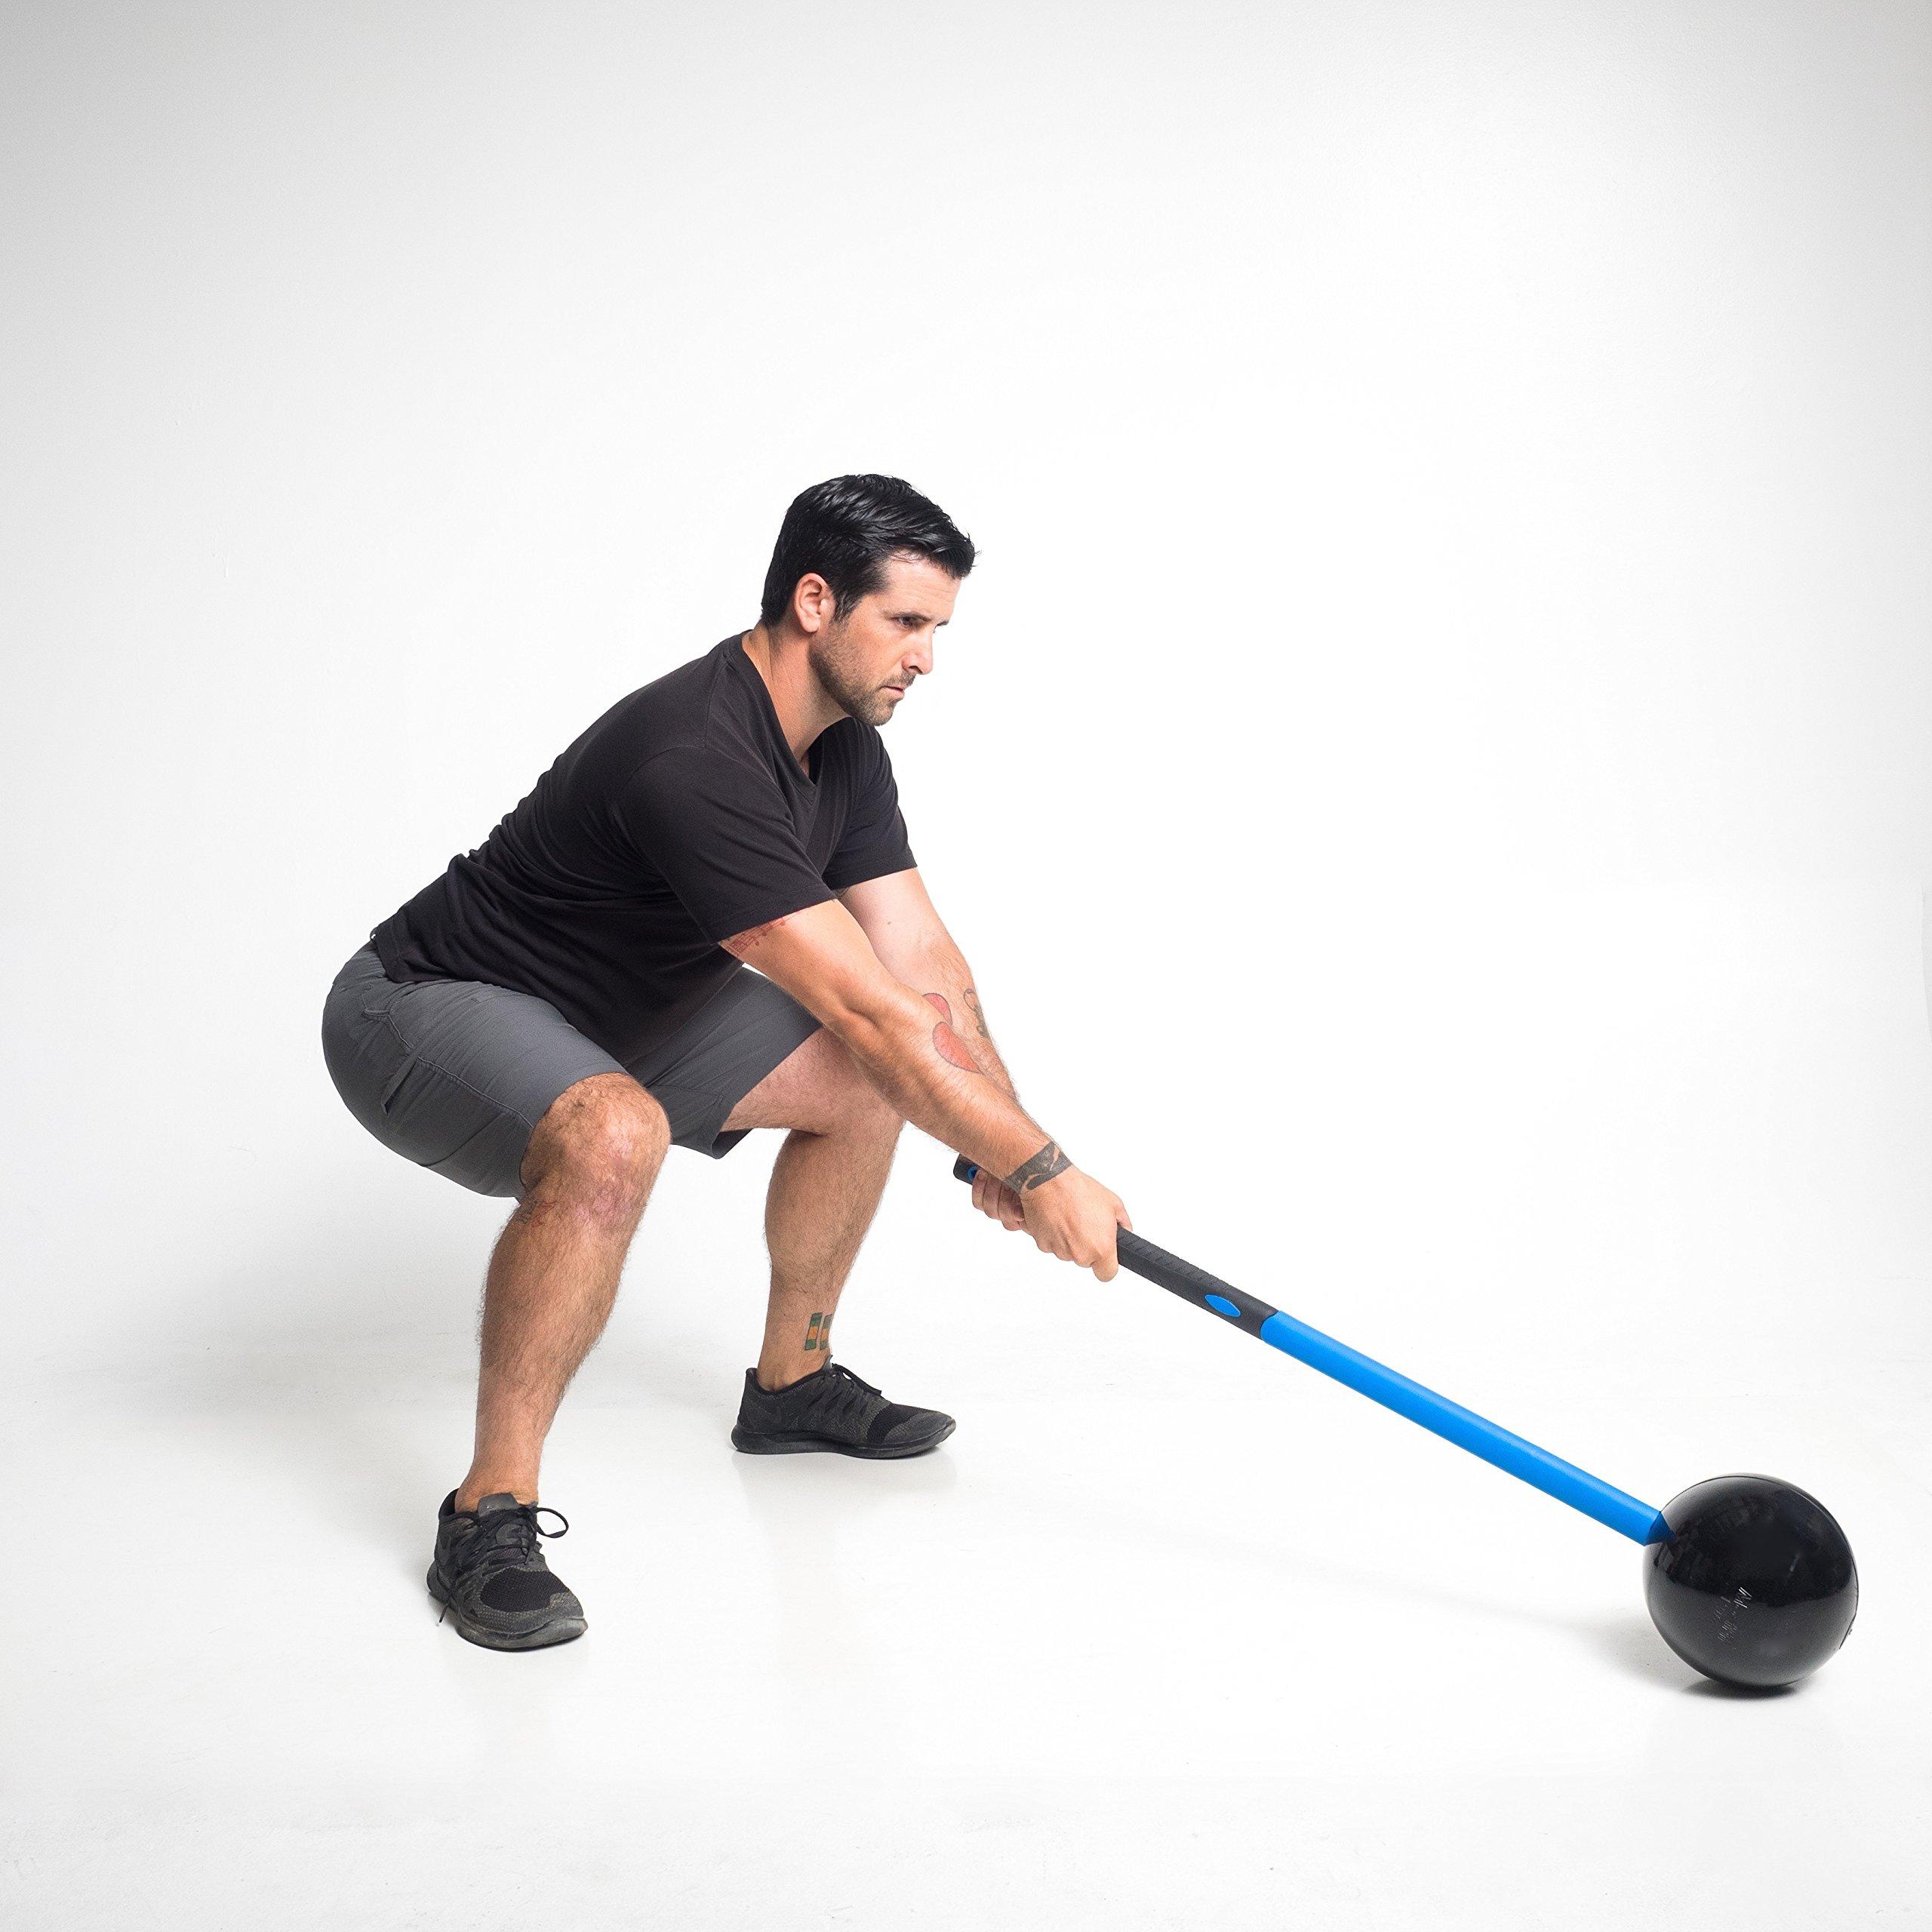 MostFit Core Hammer: Fitness Sledgehammer (8)